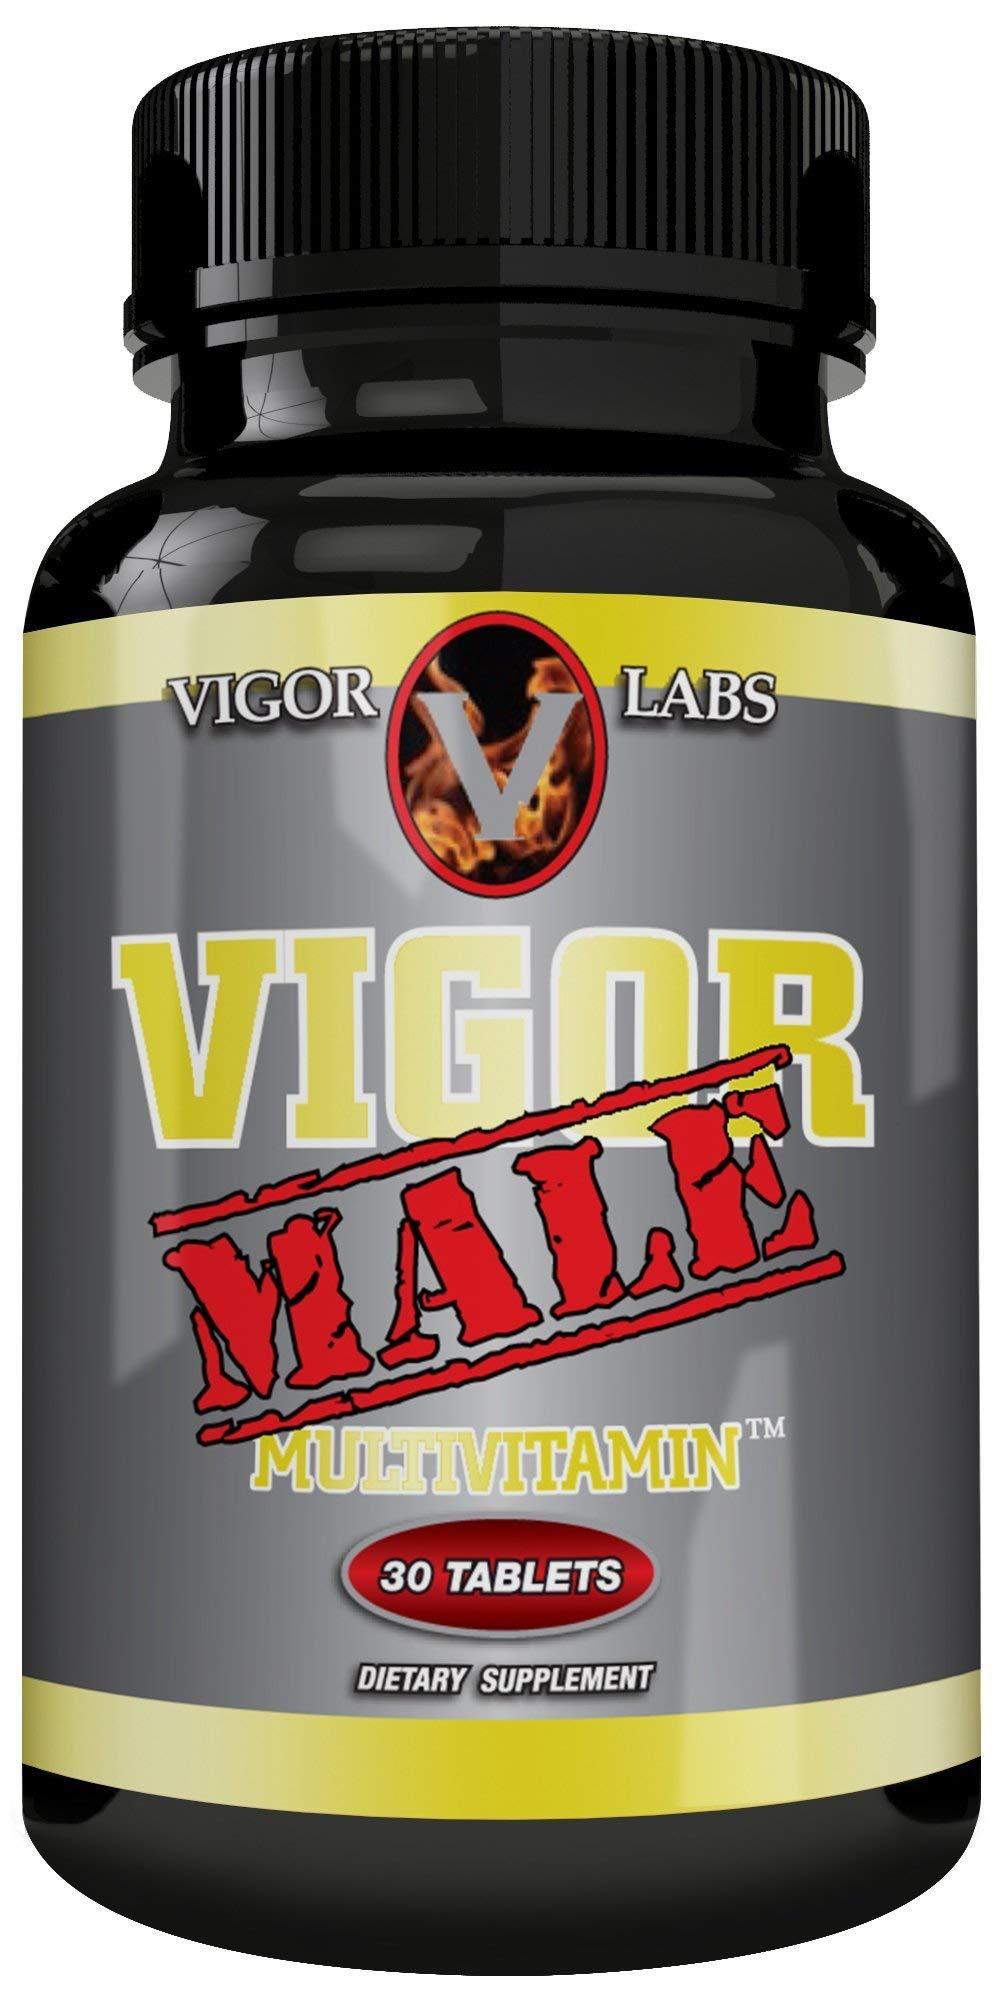 Vigor Male Multivitamin *Guaranteed Satisfaction